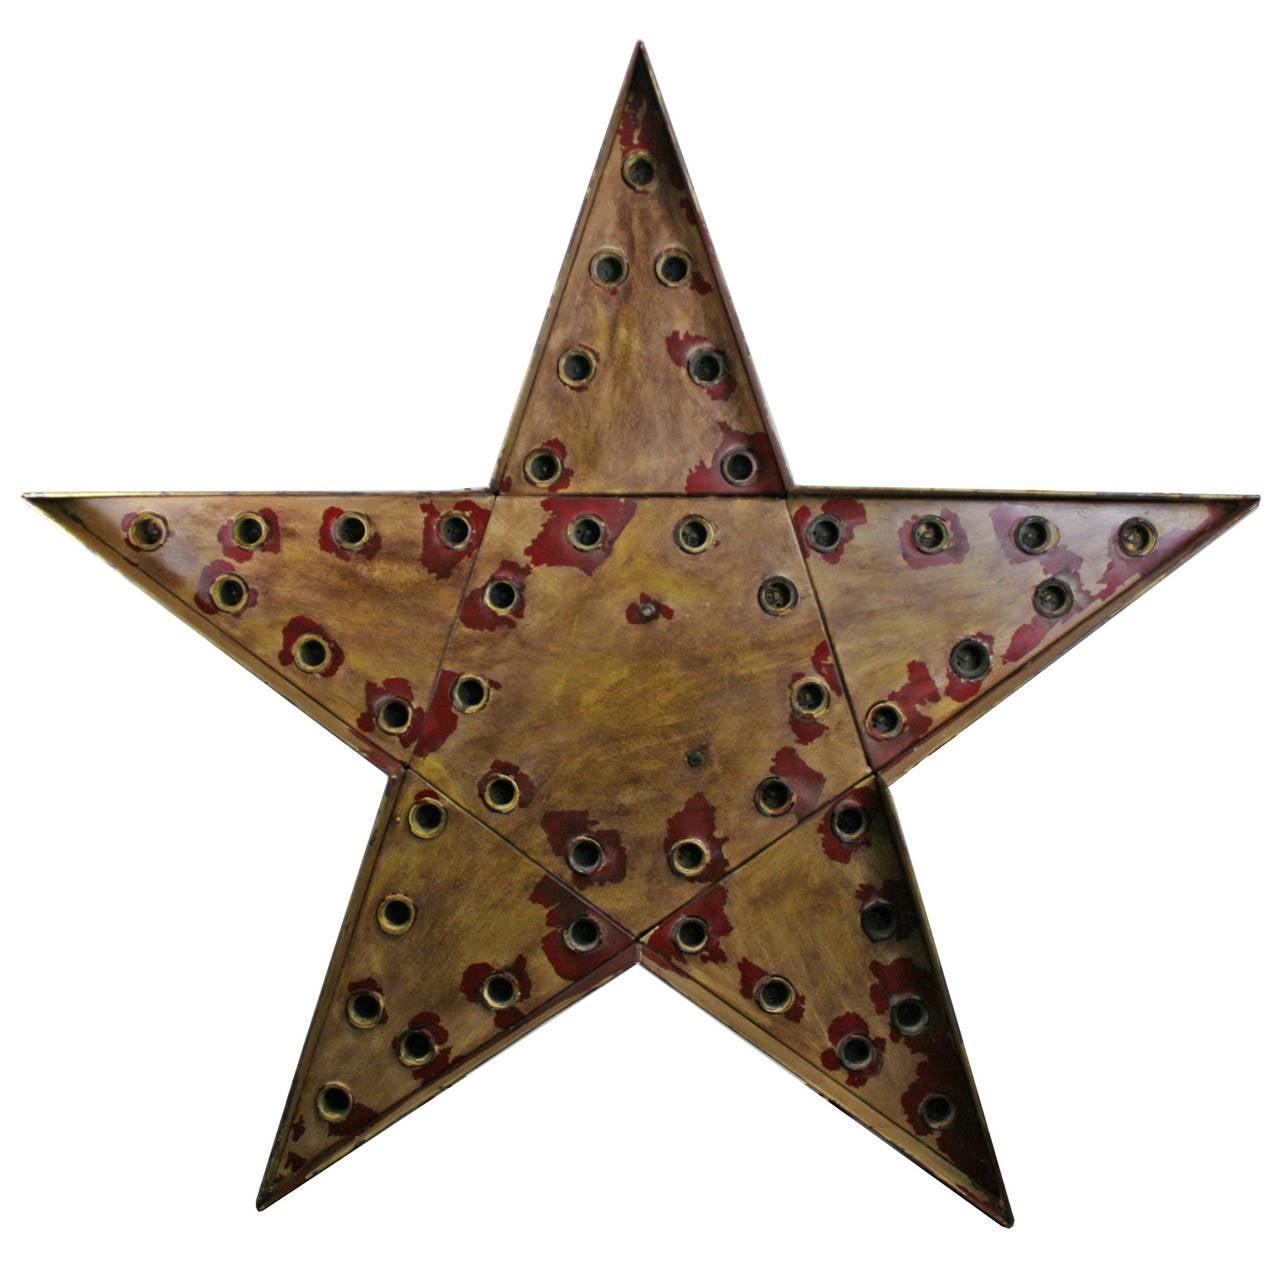 Giant Lighted Flashing Star Sign, circa 1955 3